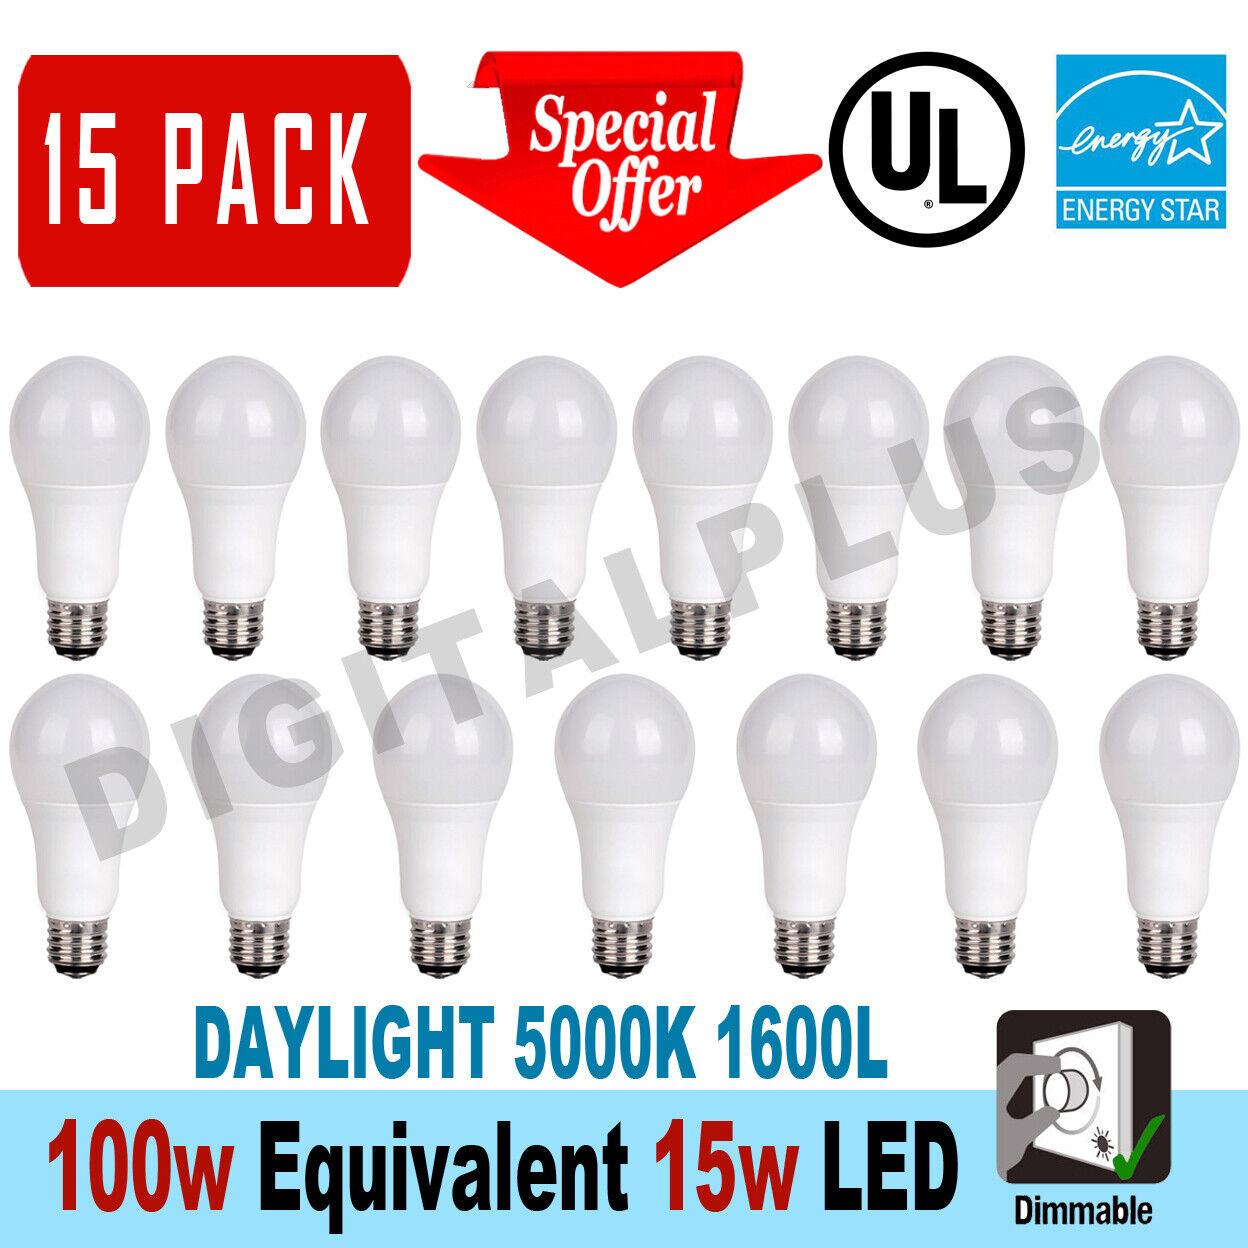 15 LED Light Bulbs 15W / 100W Replacement 1600L Daylight 500